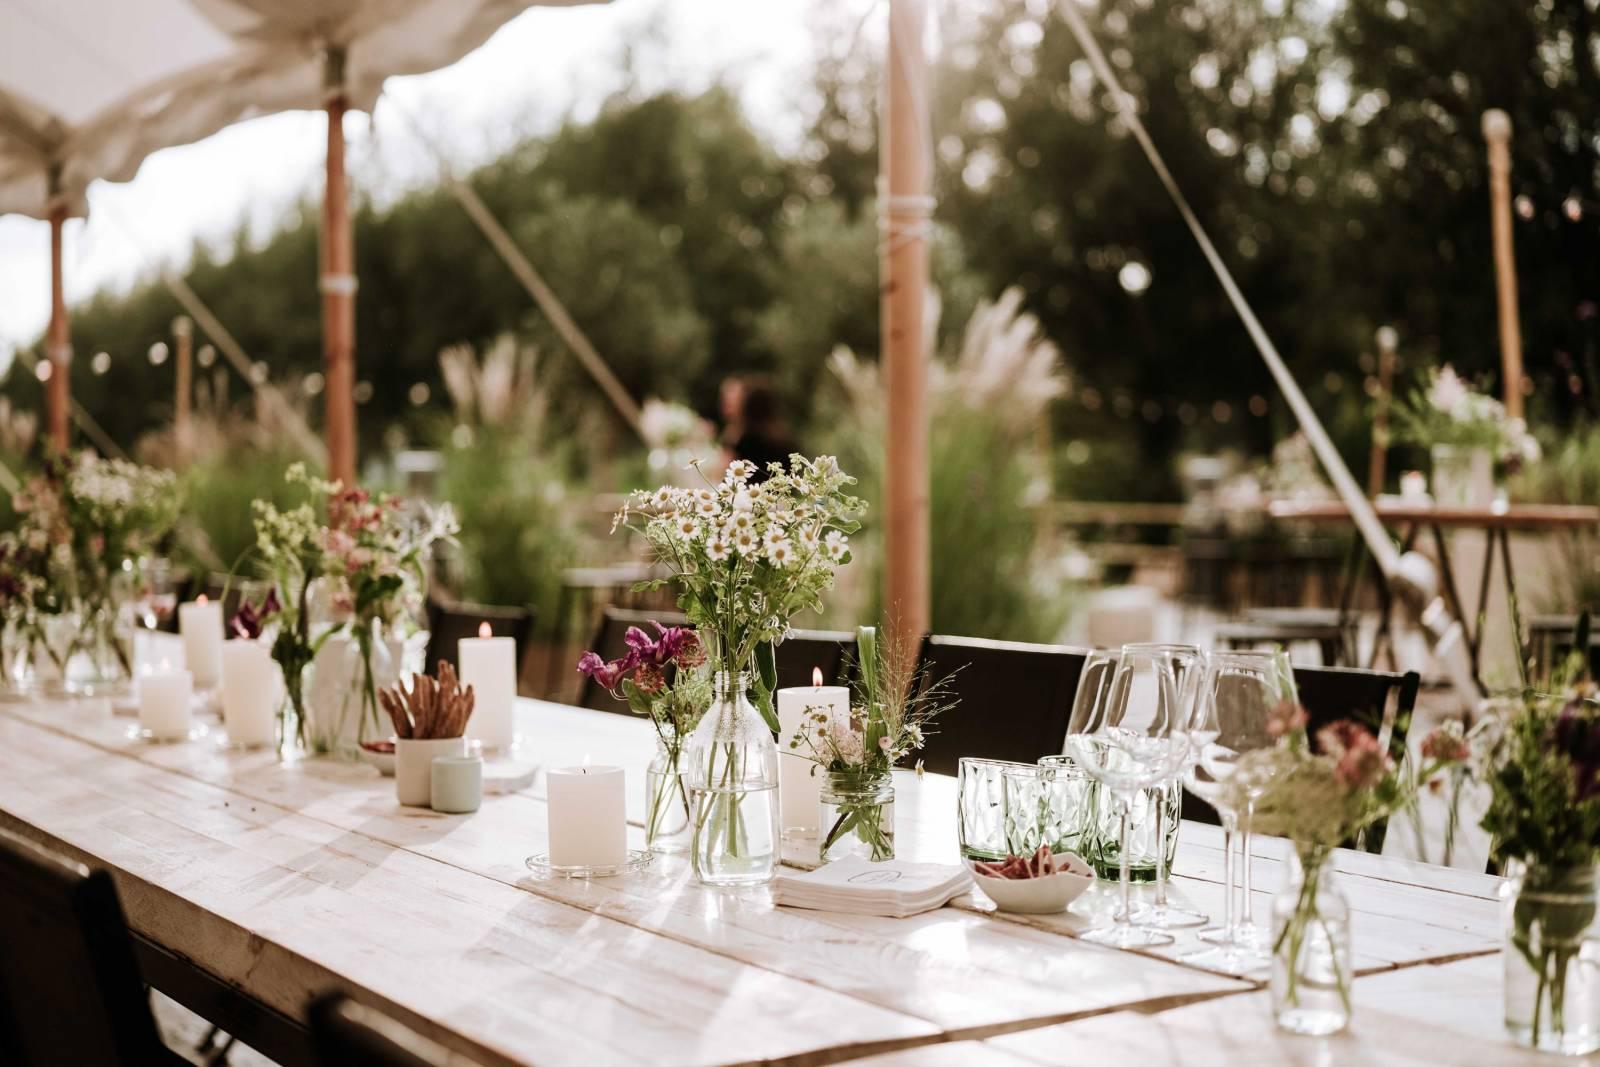 Panache Events - Wedding Planner - House of Weddings 6